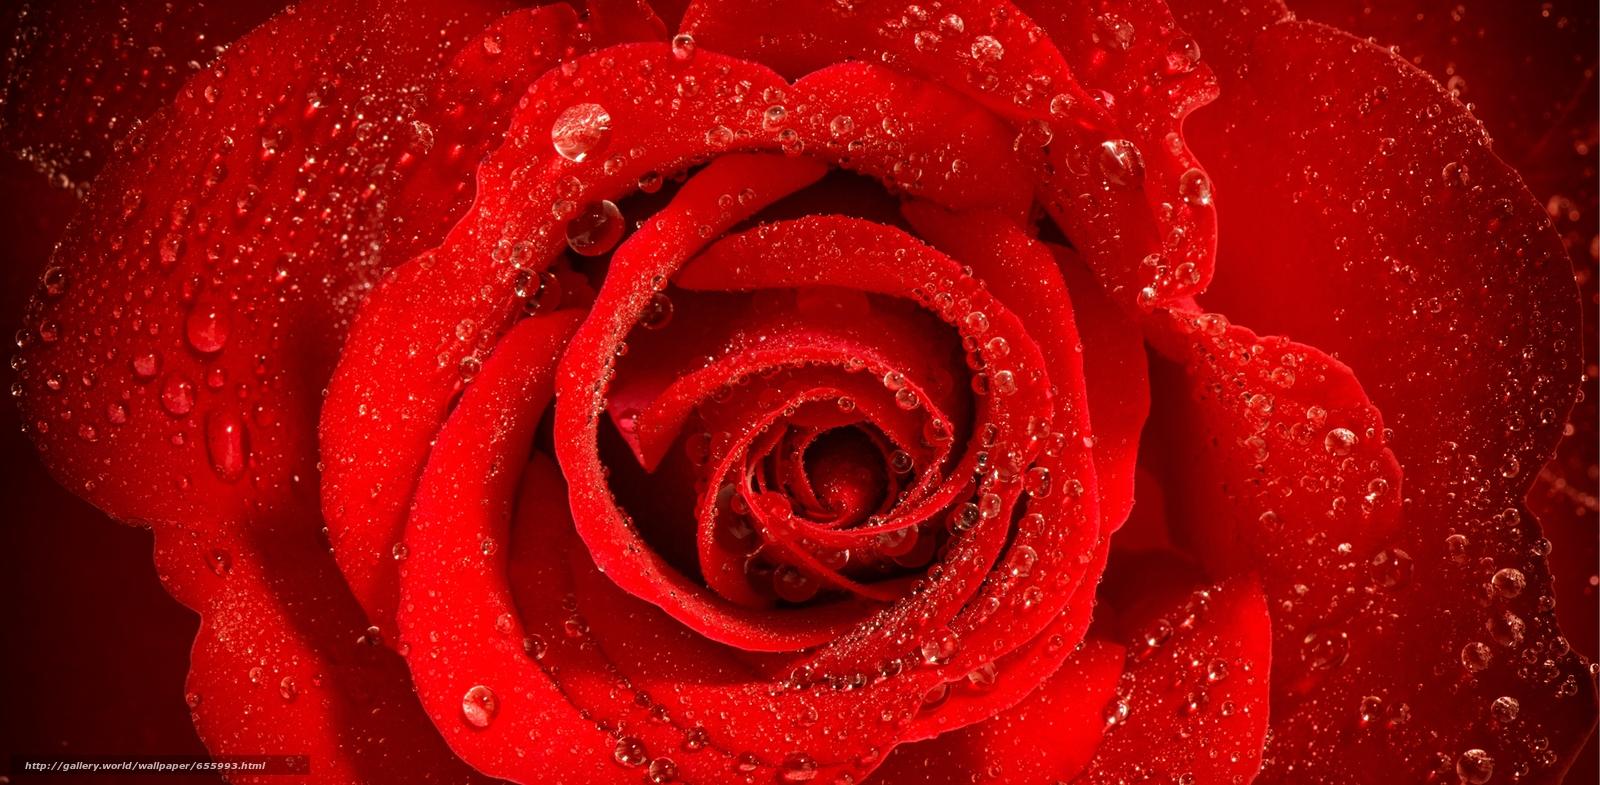 Download wallpaper rose,  BUD,  Petals,  drops free desktop wallpaper in the resolution 5265x2583 — picture №655993